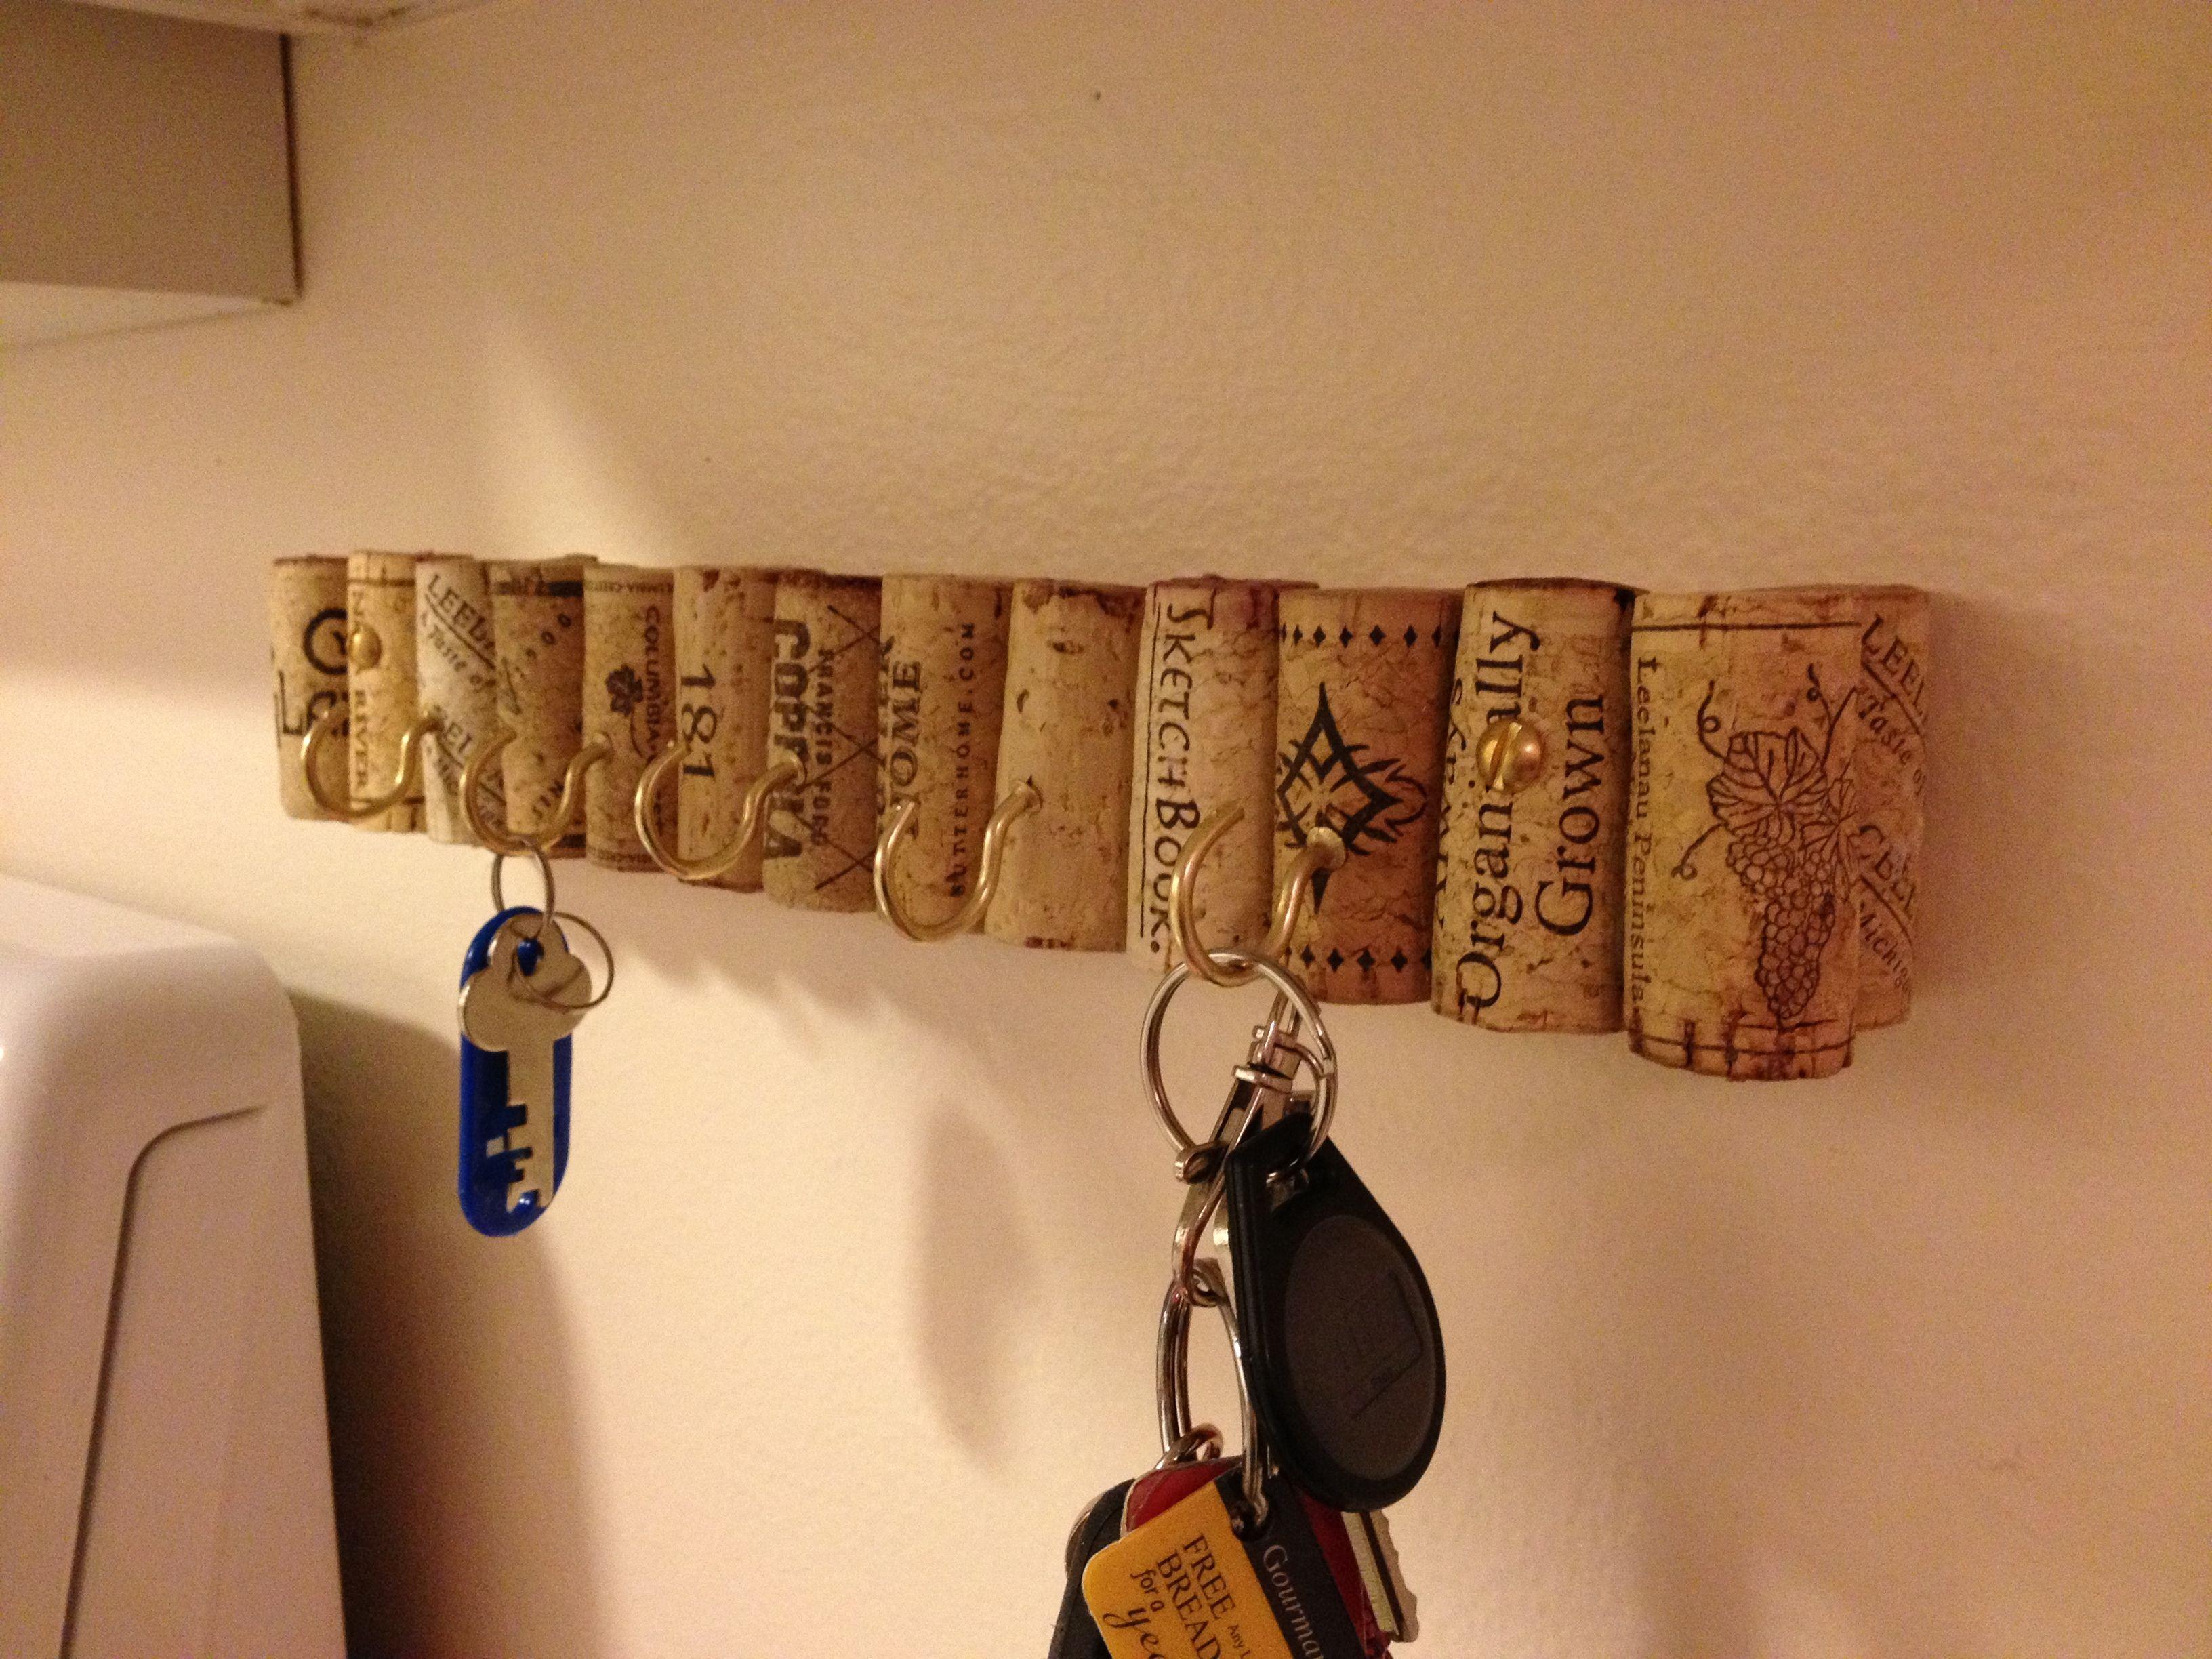 Diy recycled corks key rack corks wine bottles for Wine cork diy ideas